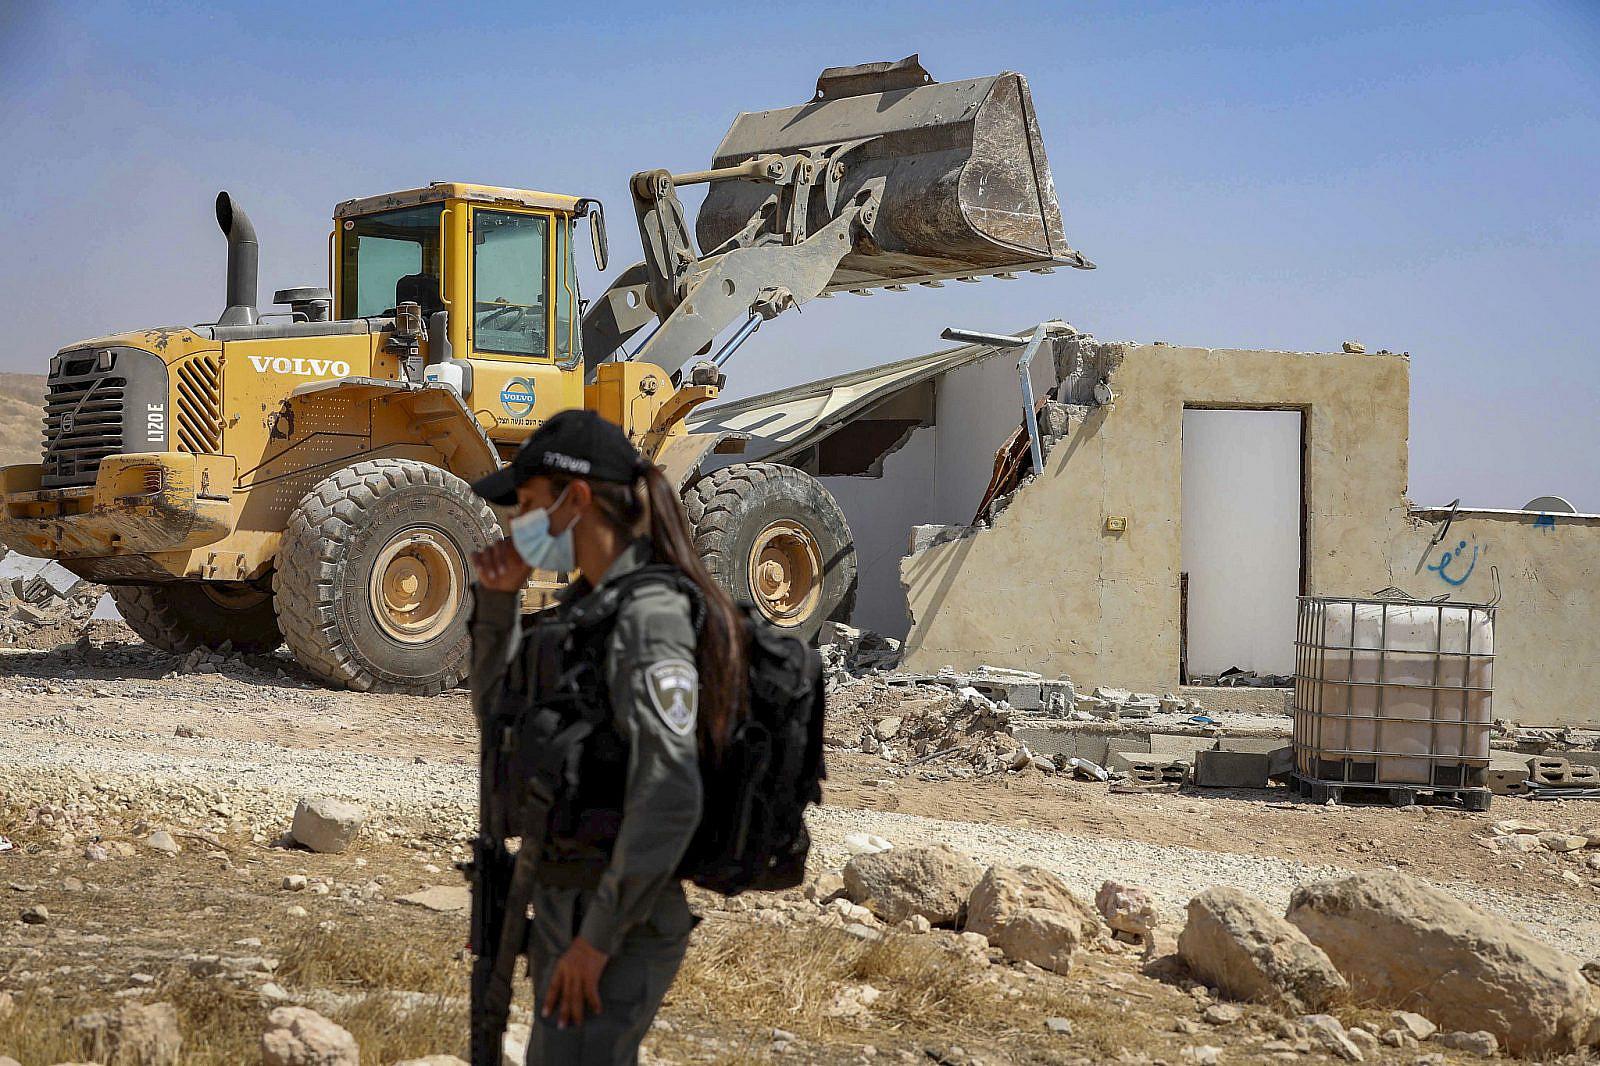 Israeli border police officers guard as Israeli authorities demolish a Palestinian house near the West Bank city of Hebron, Sep. 2, 2020. (Wisam Hashlamon/Flash90)